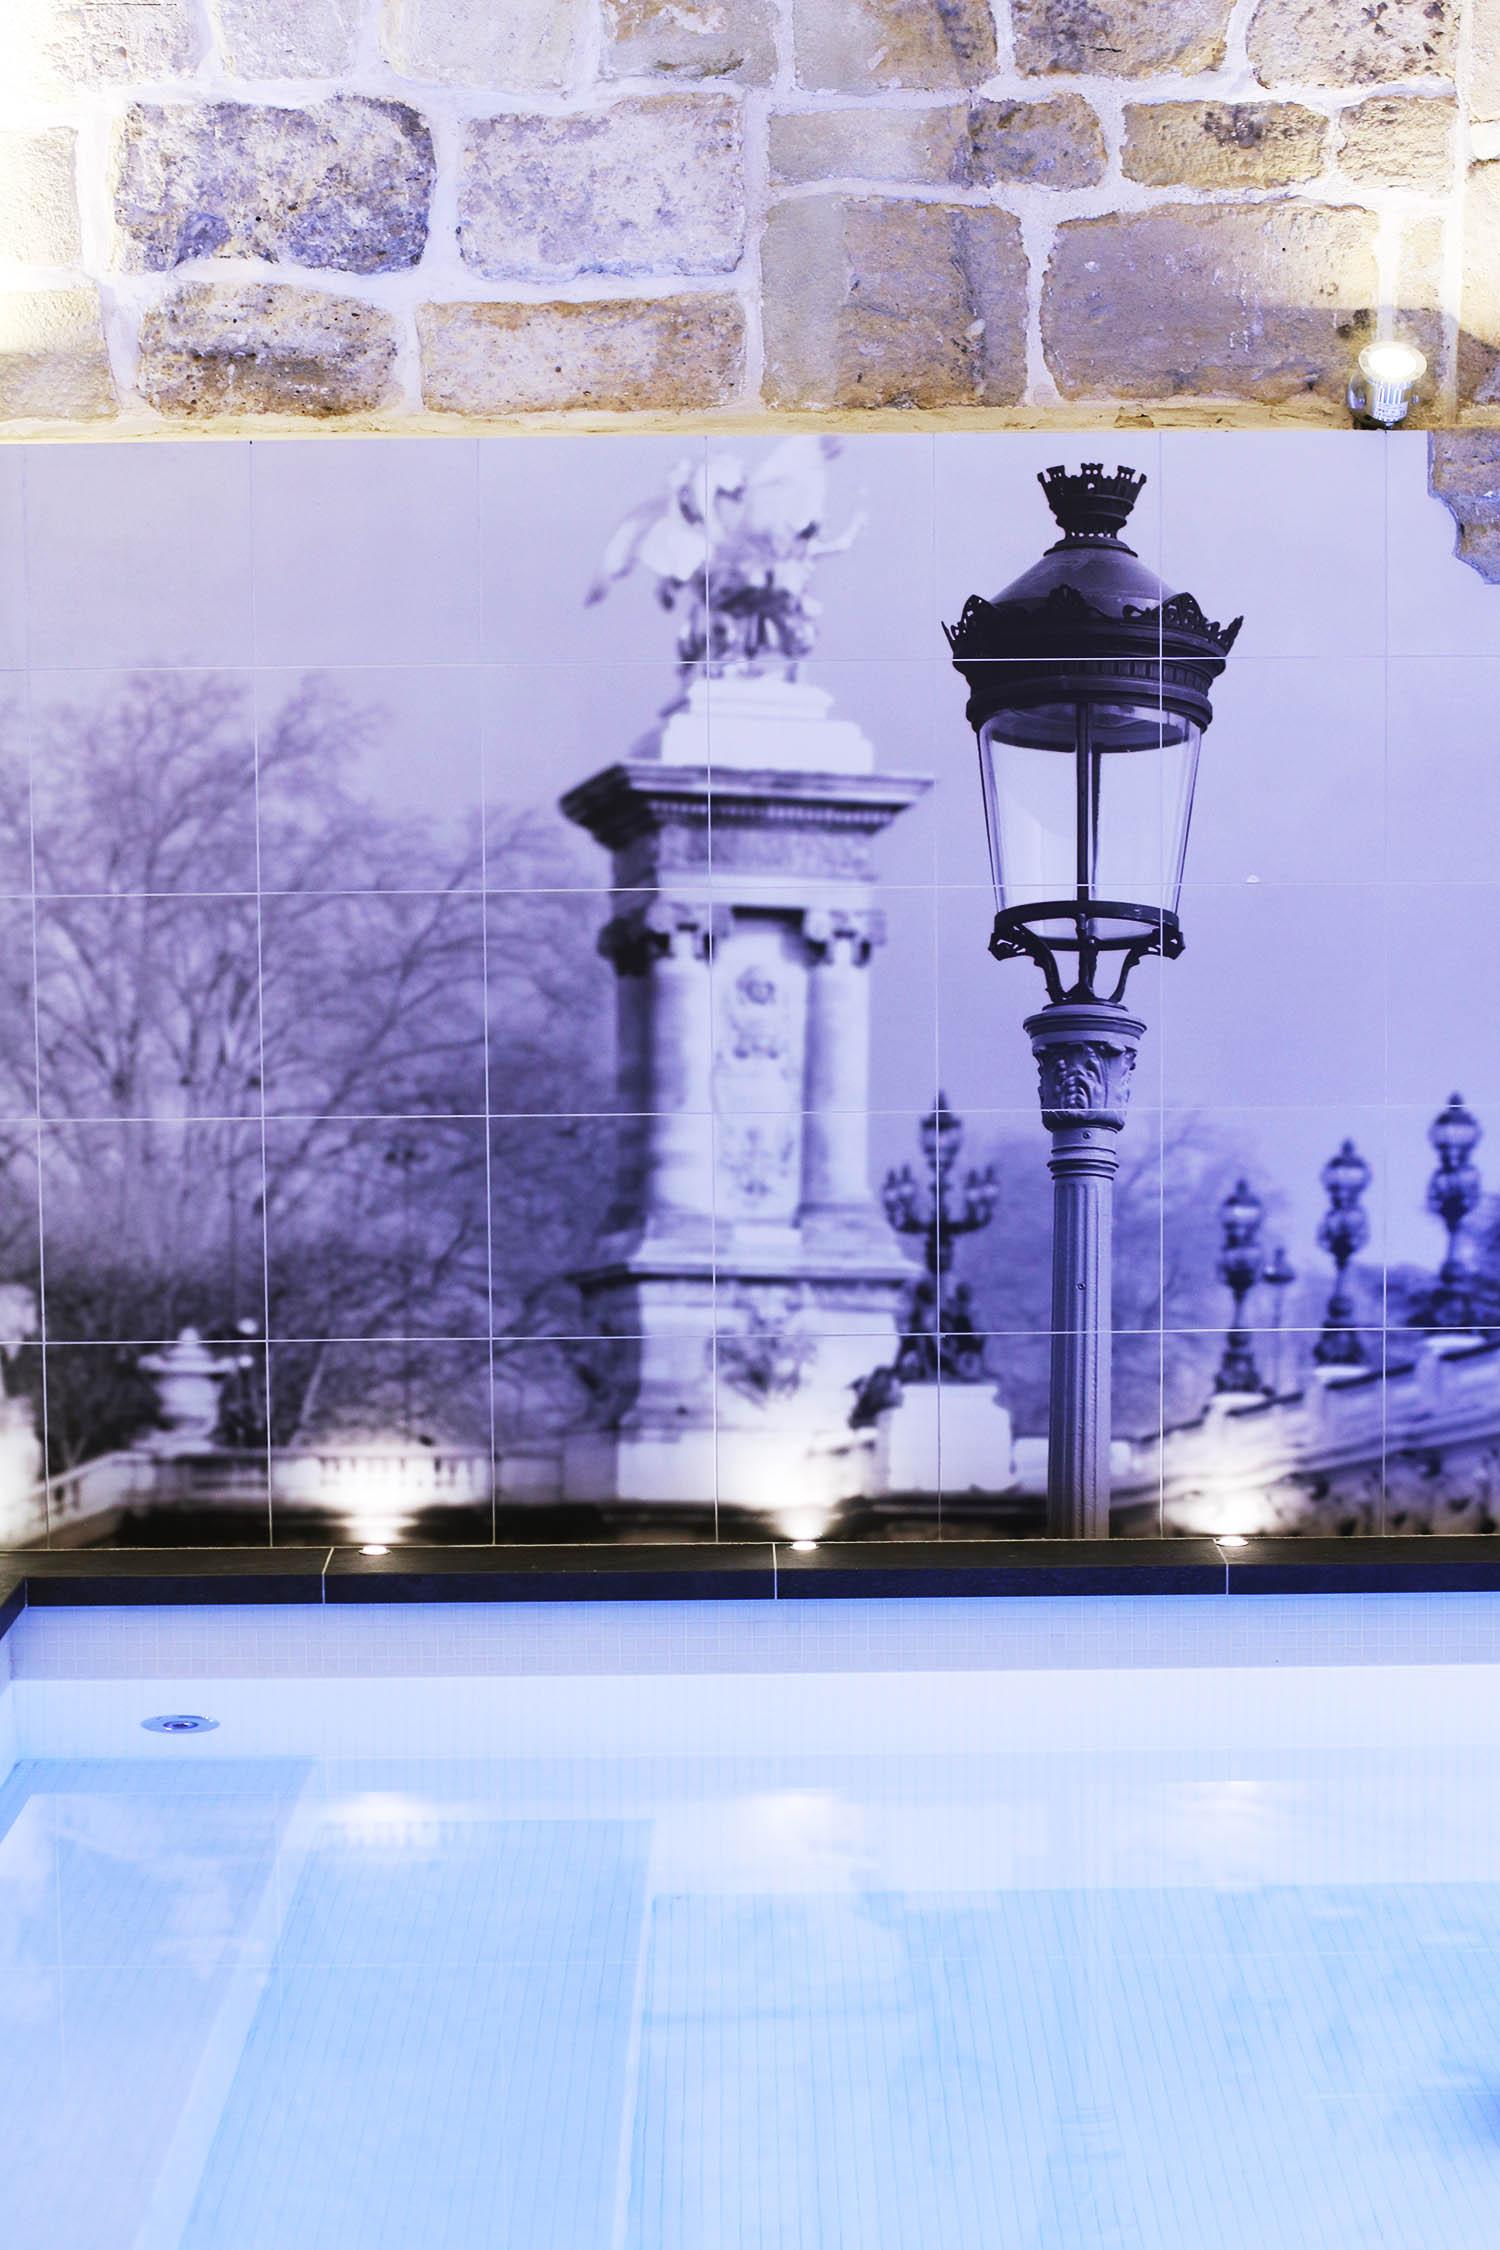 une nuit l 39 hotel la lanterne elodie in paris. Black Bedroom Furniture Sets. Home Design Ideas